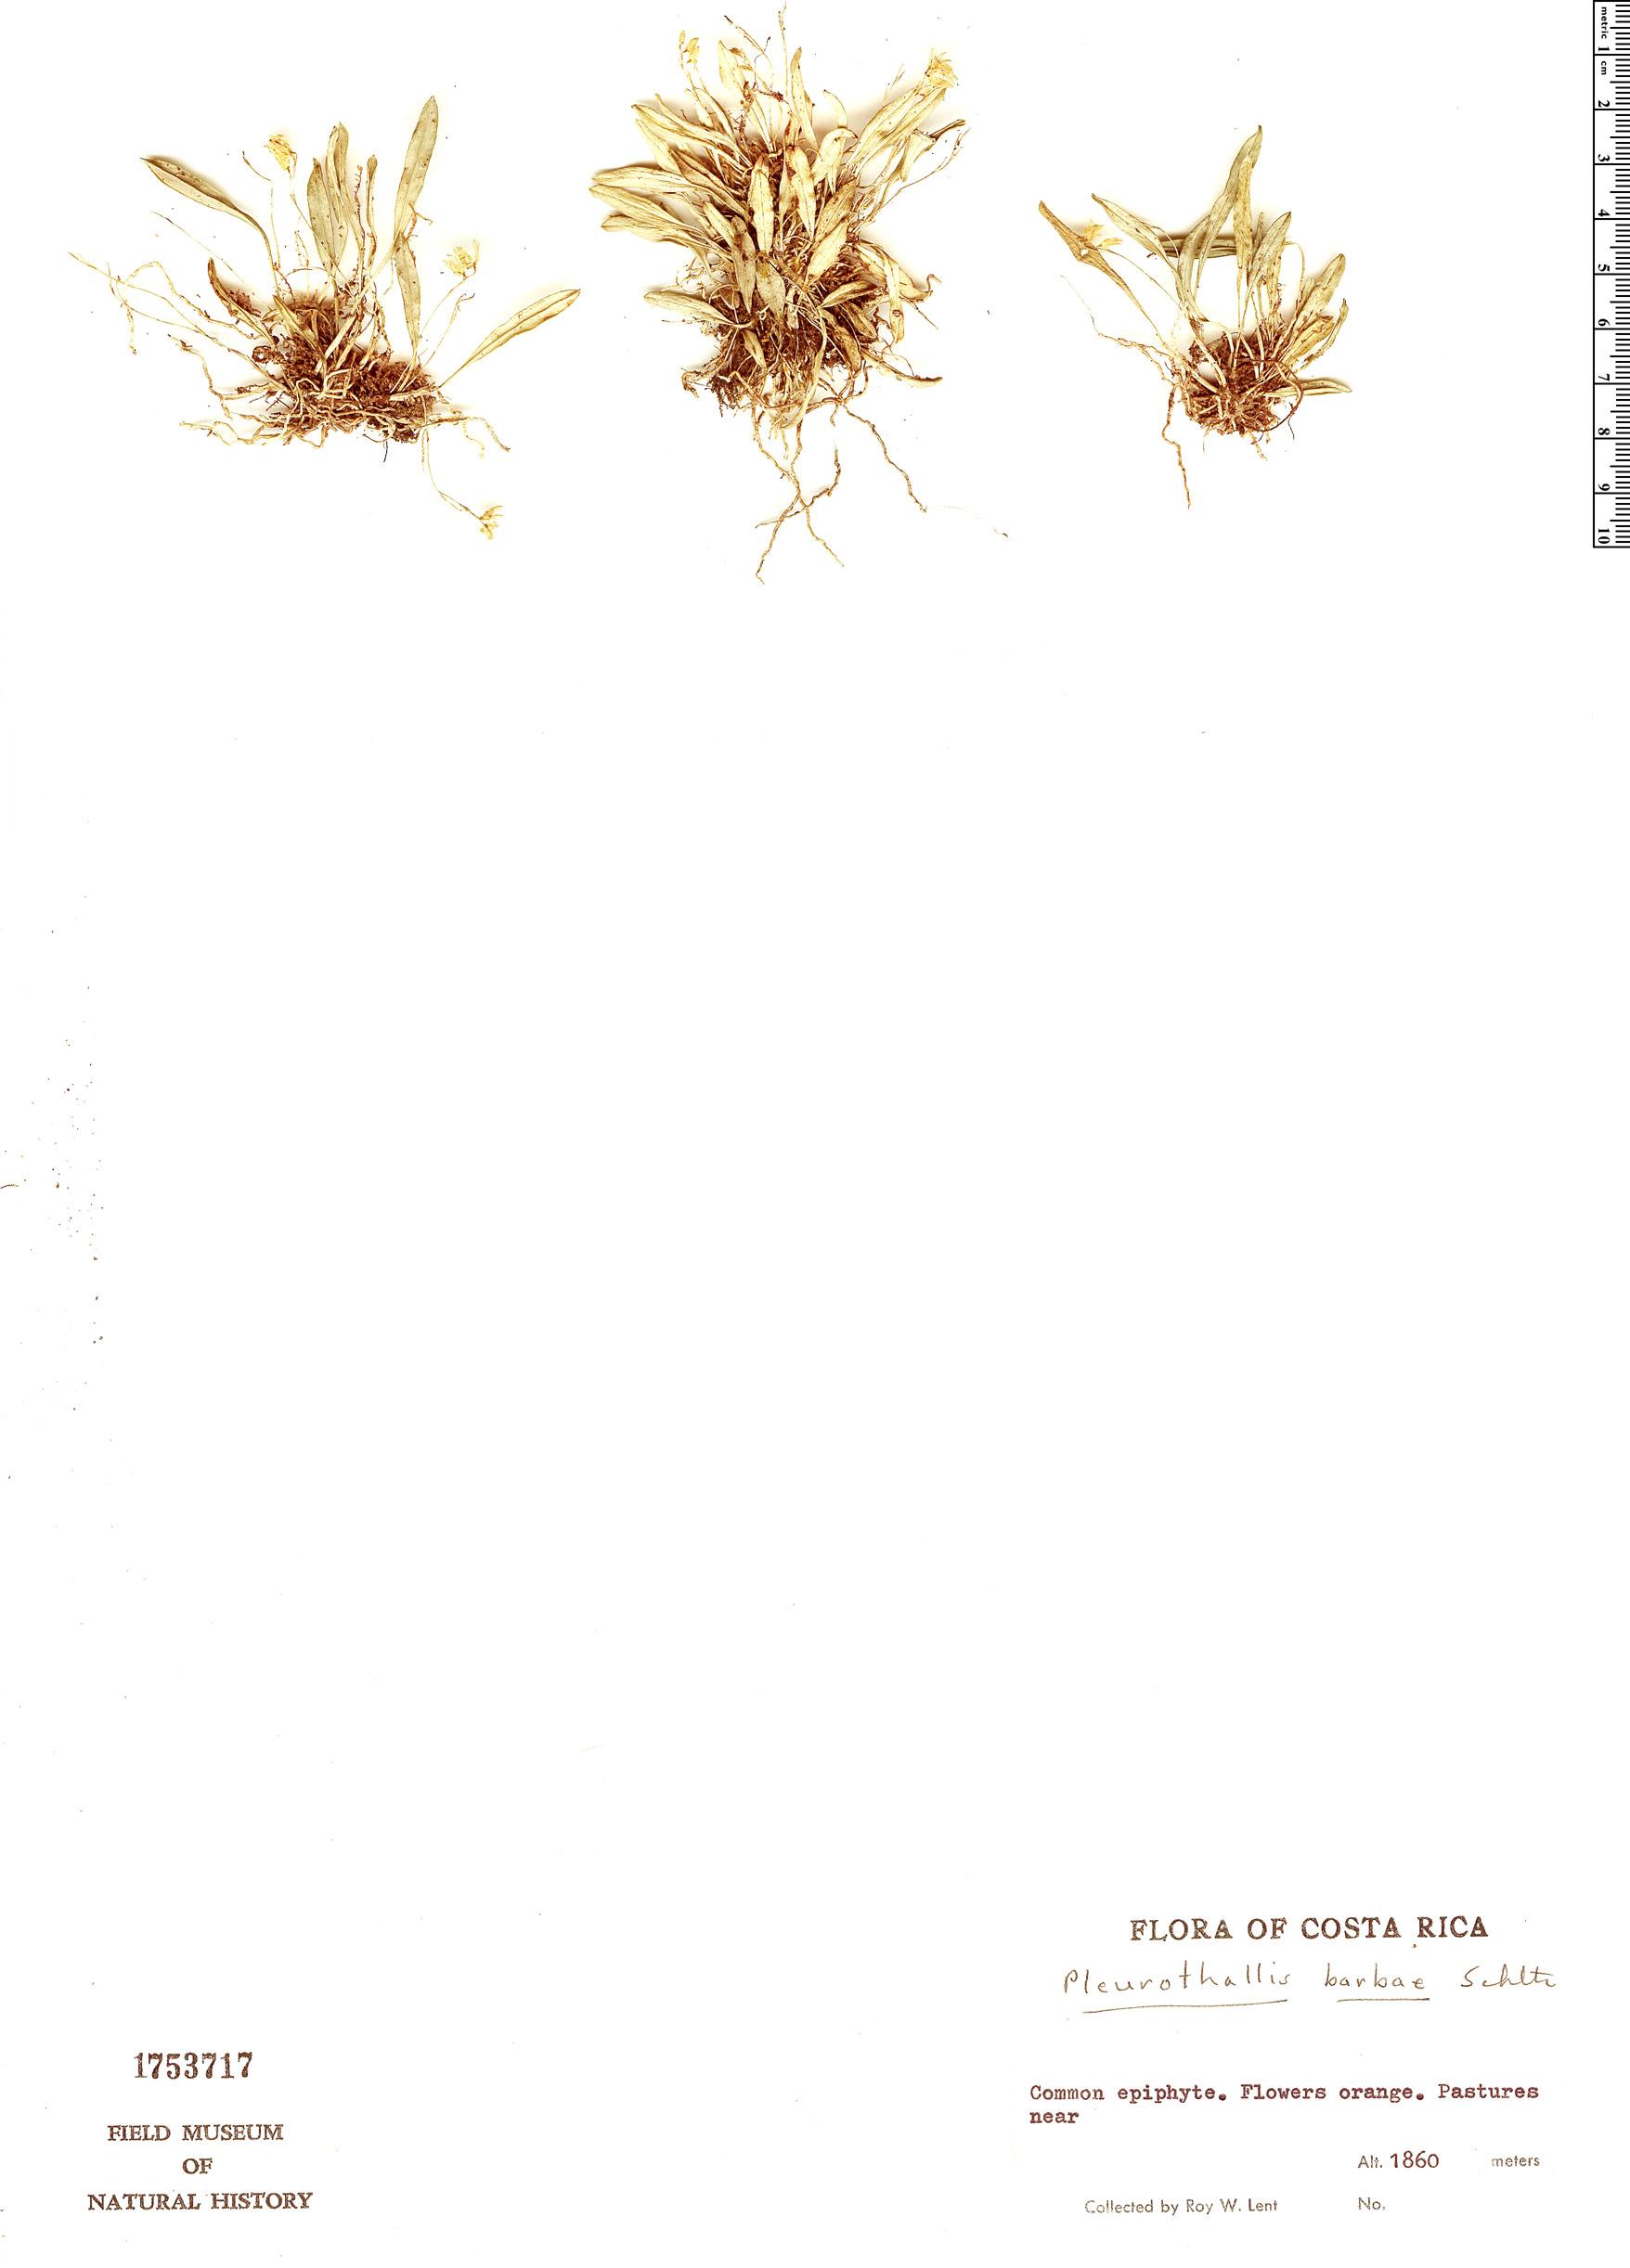 Specimen: Pleurothallis barbae